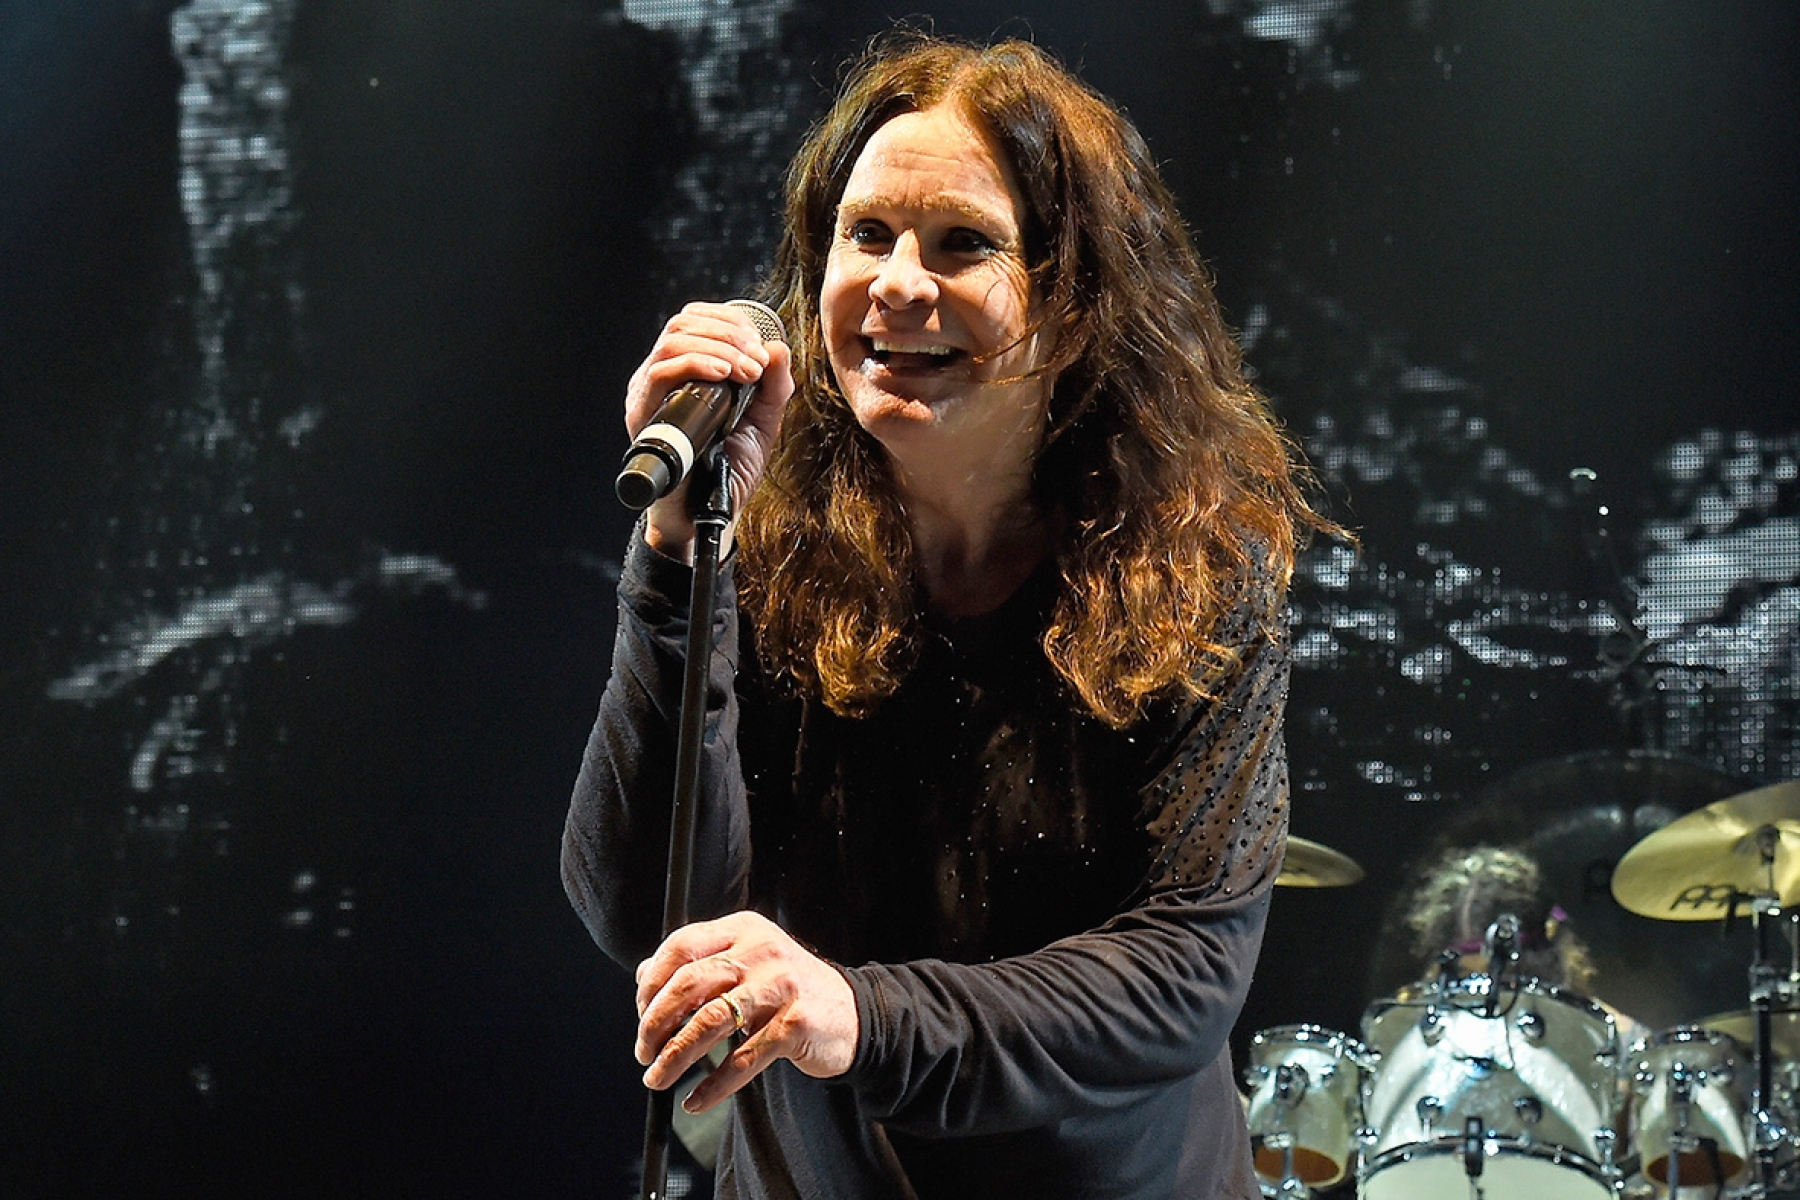 Ozzy Osbourne Sues Concert Promoter AEG, Seeks Class